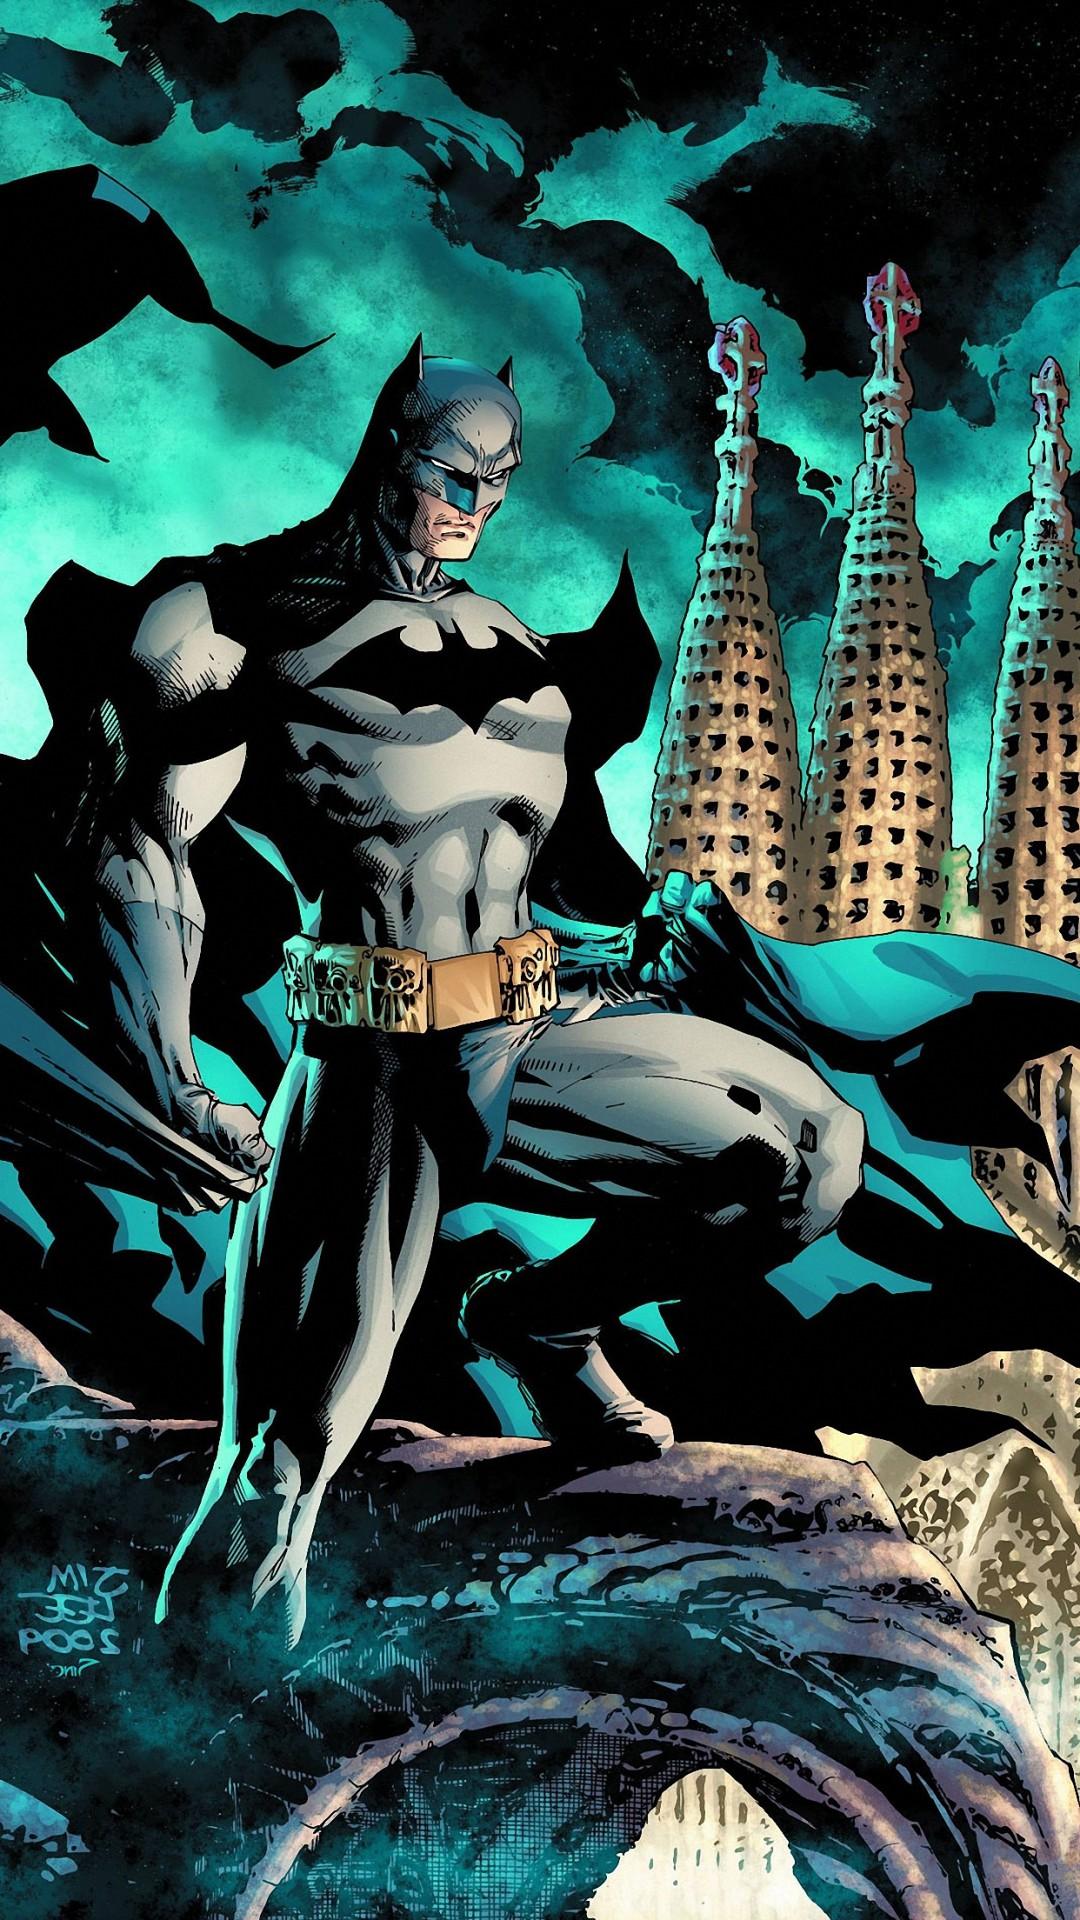 Batman Movie Joker Wallpaper | Movie HD Wallpapers | Batstuff | Pinterest |  Joker, Batman and Dark knight